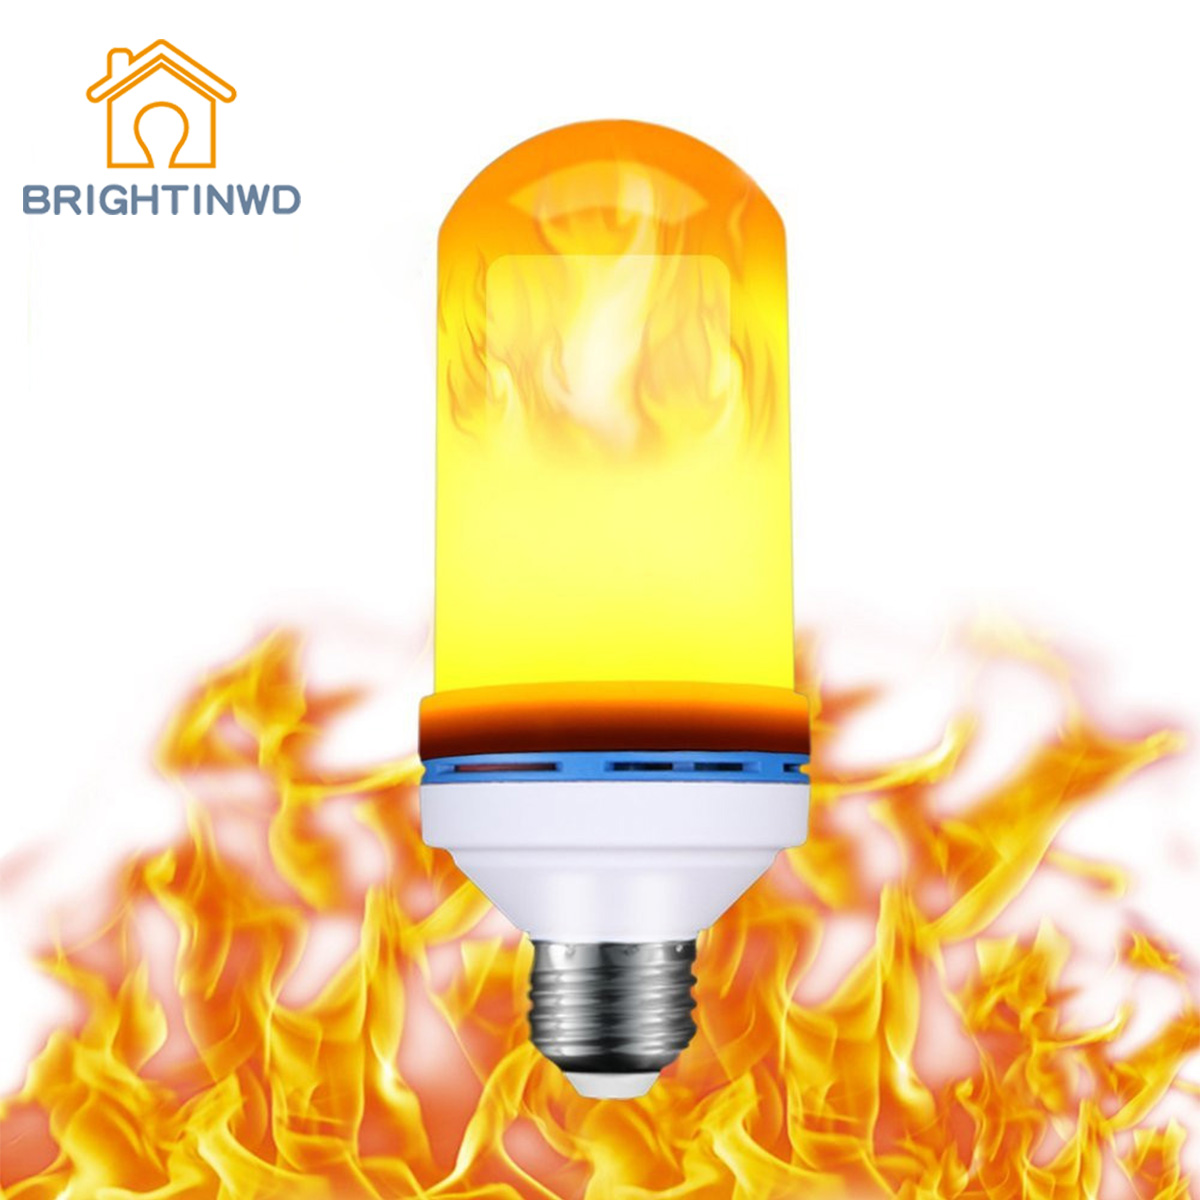 BRIGHTINWD Flame Light LED Torch Light Emulation Flame E27 Dancing Light Bar Light Bulb 7W flame trees of thika